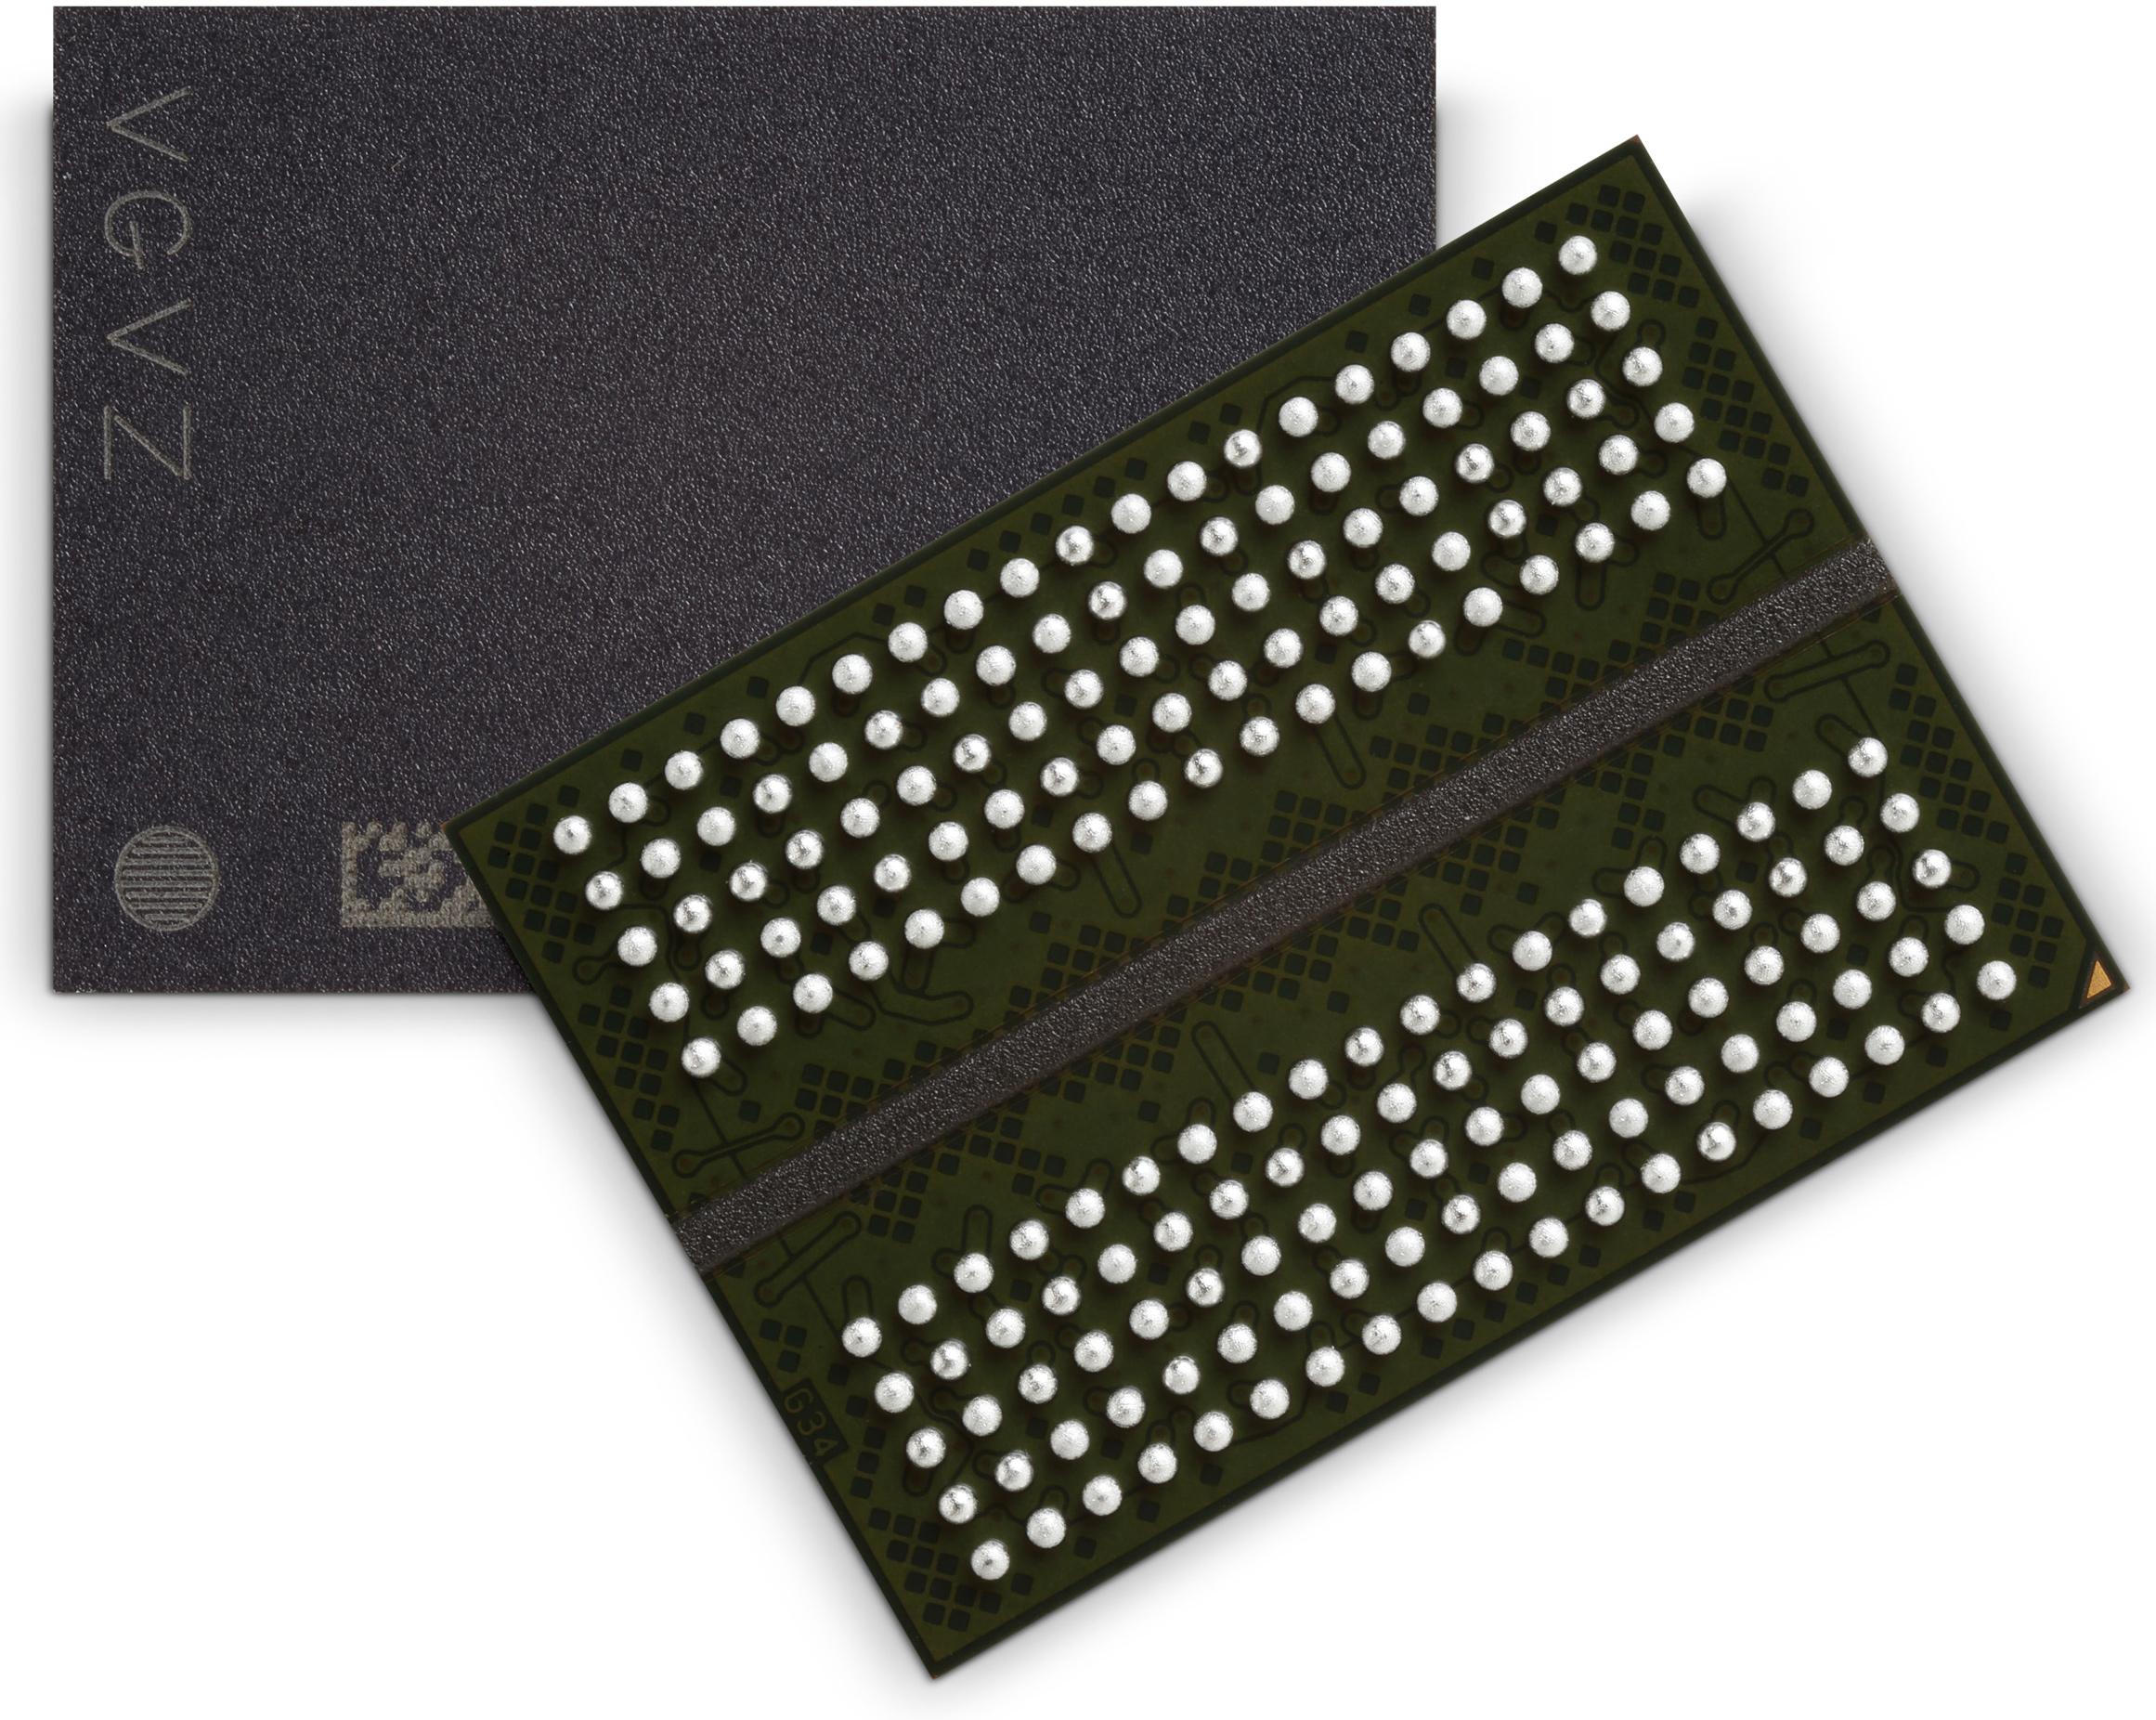 Micron GDDR6